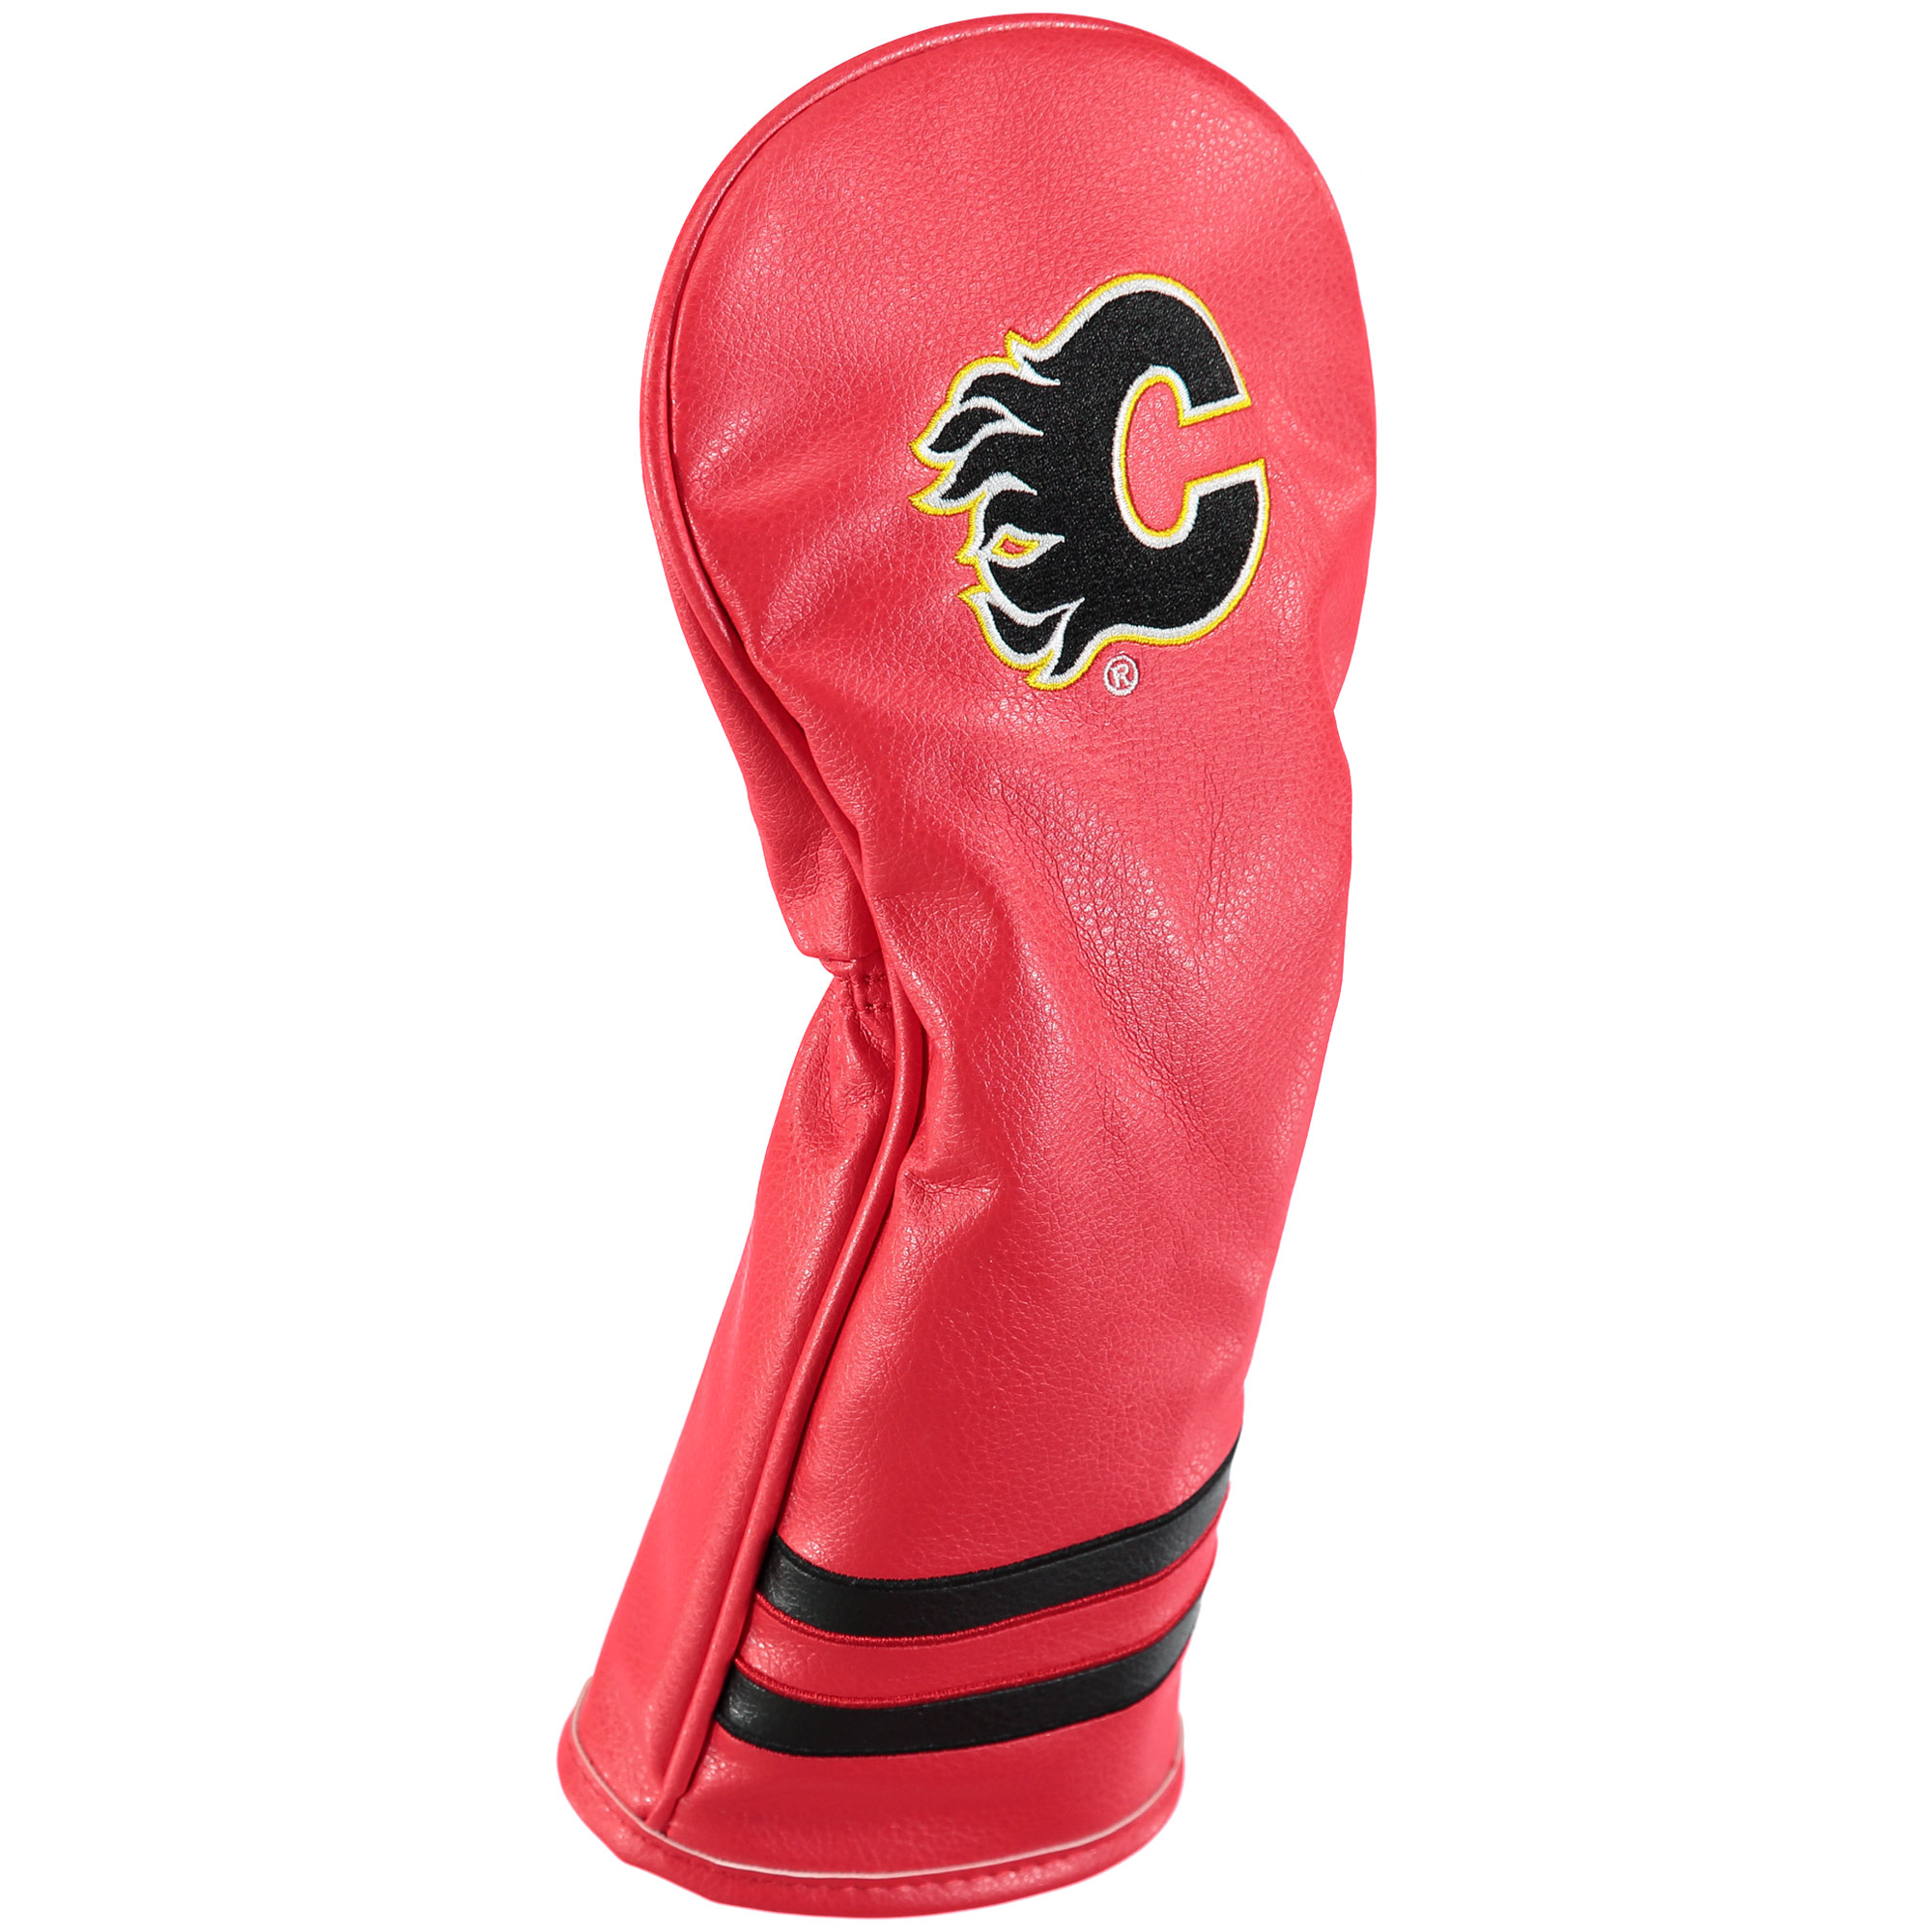 Calgary Flames Vintage Fairway Headcover - No Size